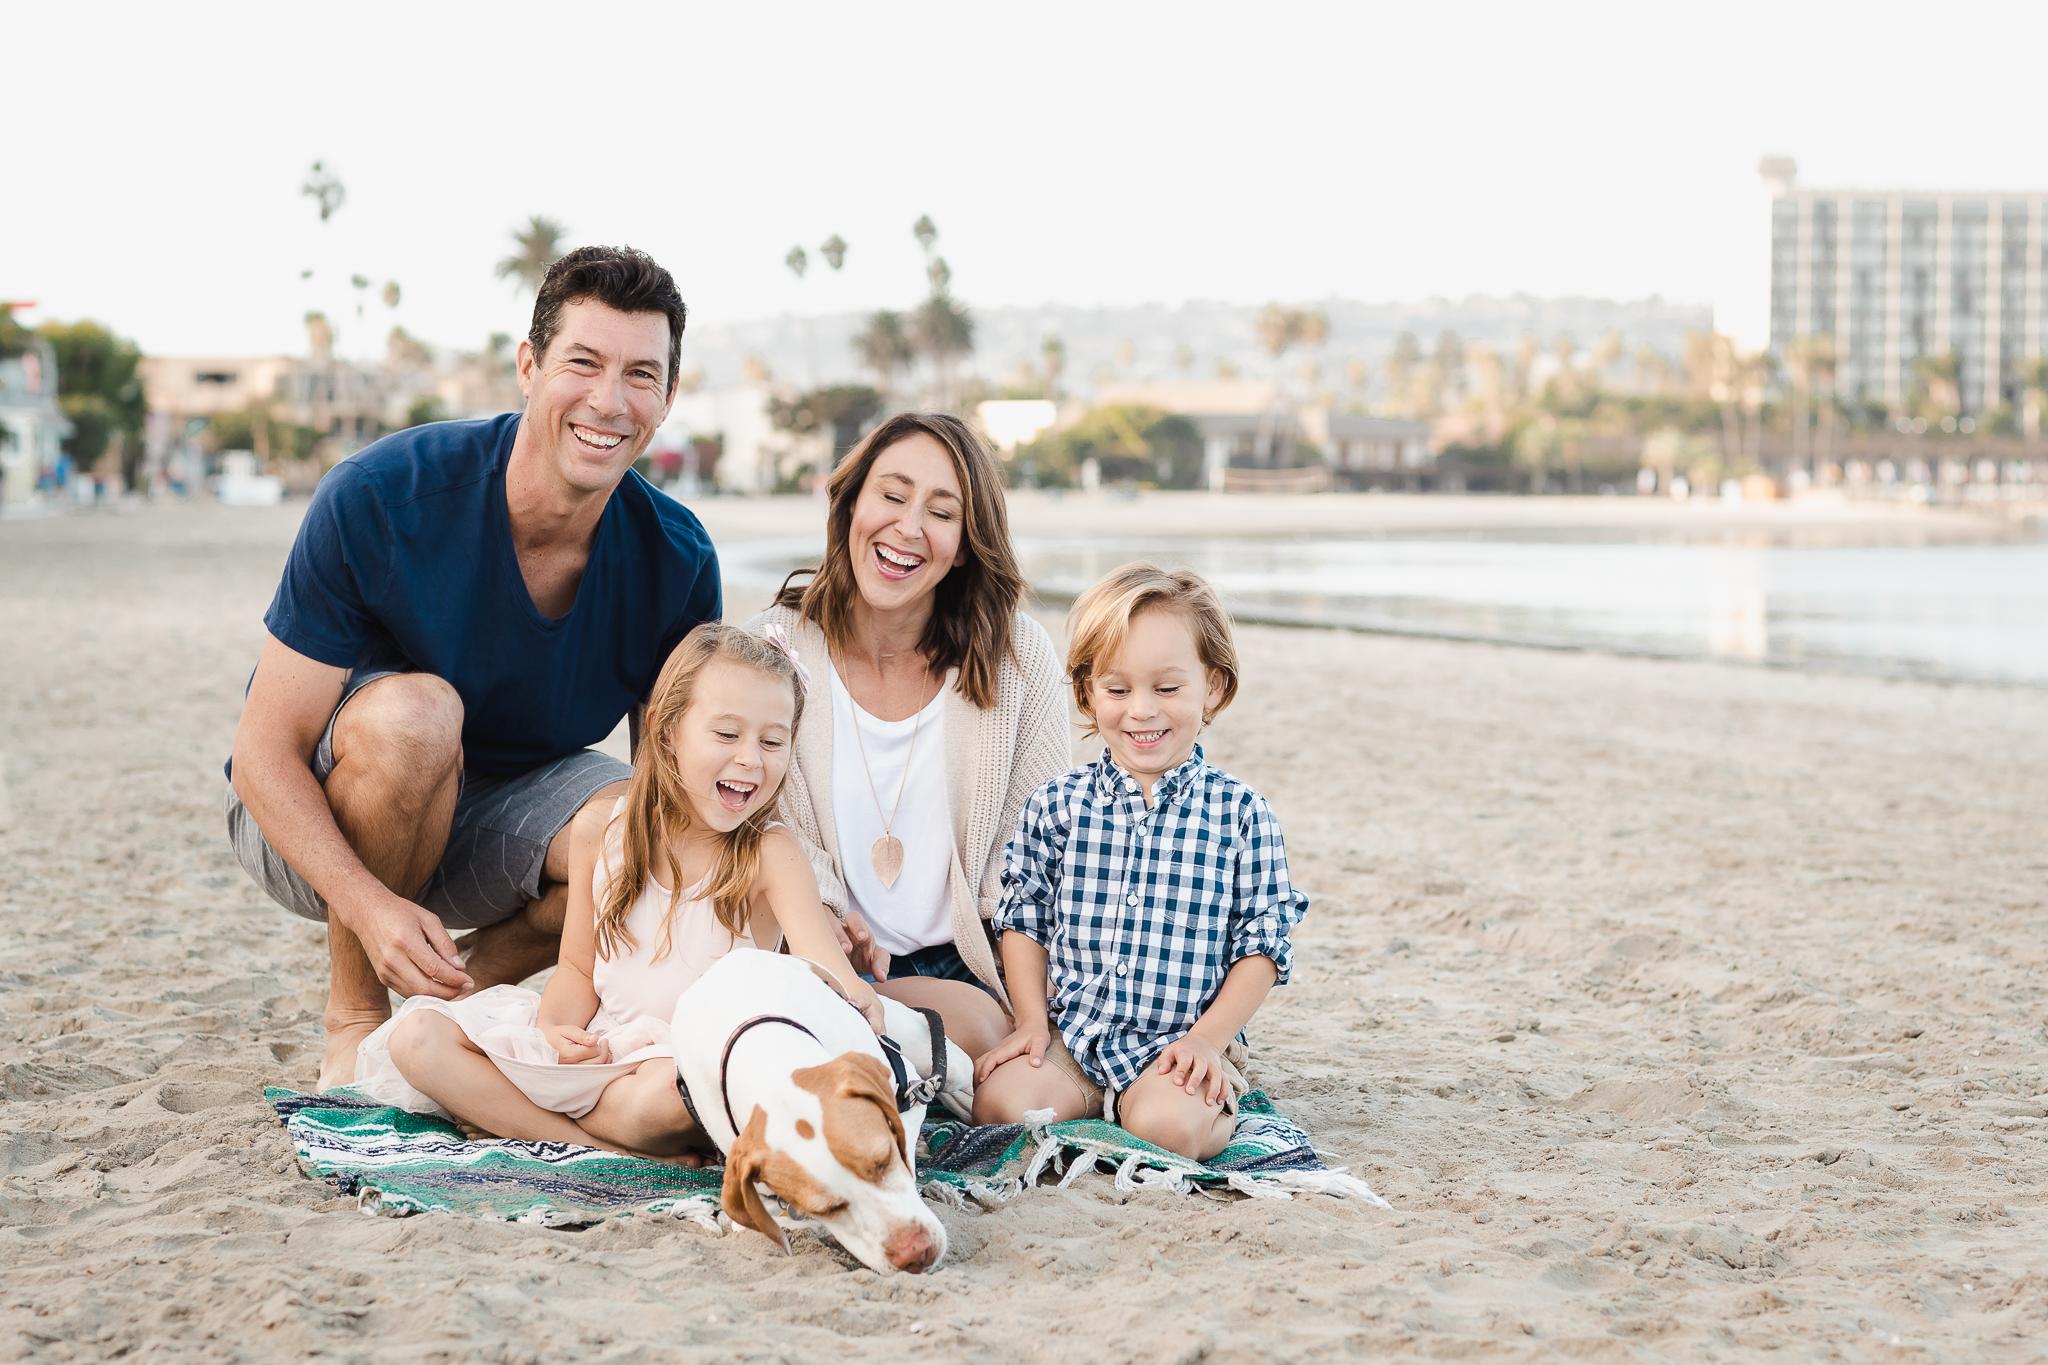 San Diego Vacation Family Photos